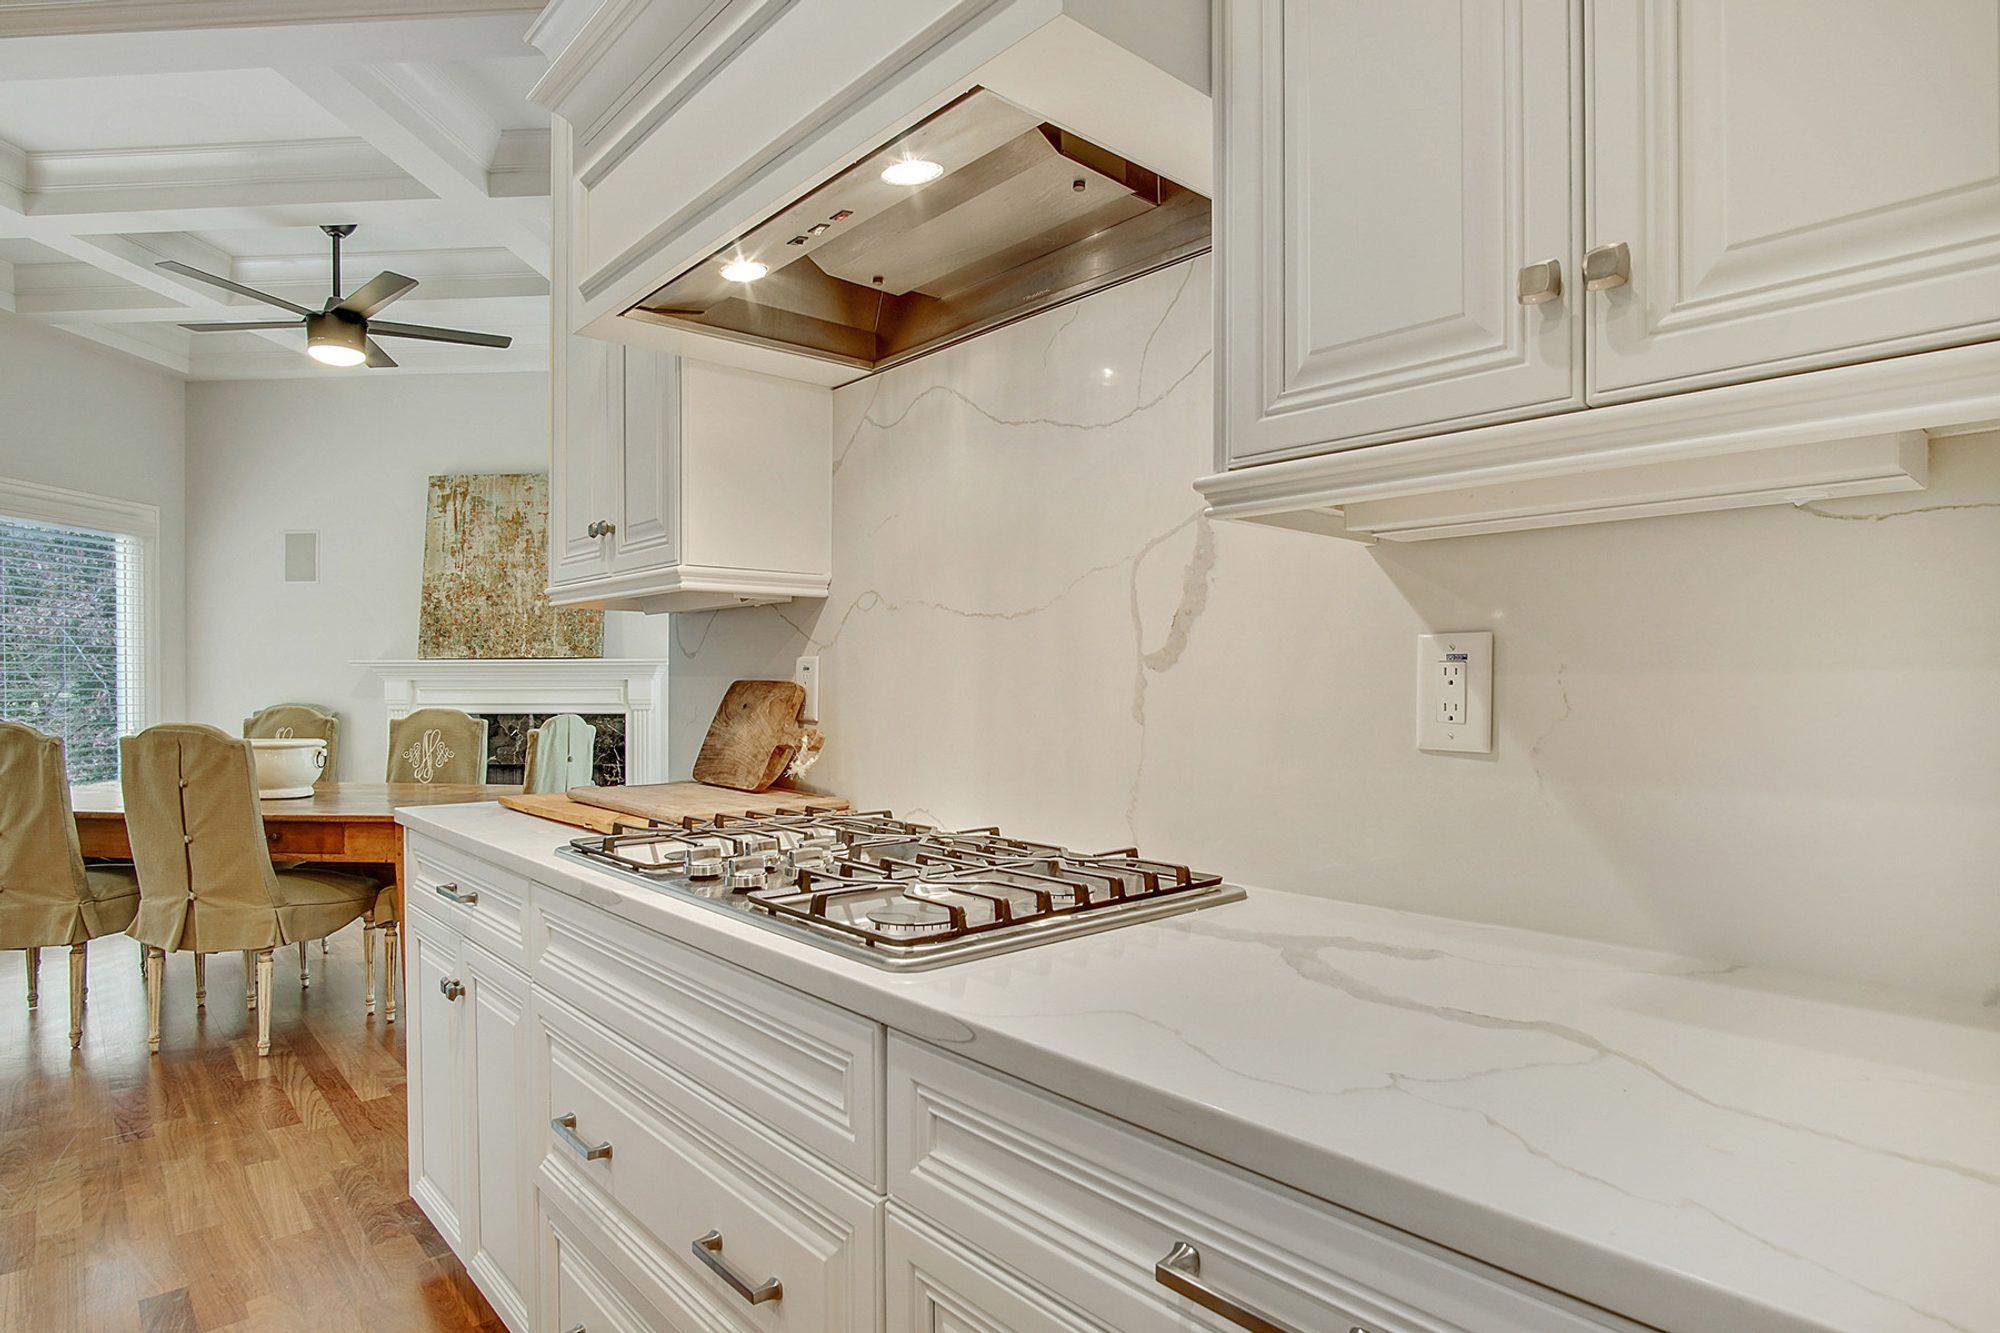 White kitchen cabinets with solid marble quartz backsplash.